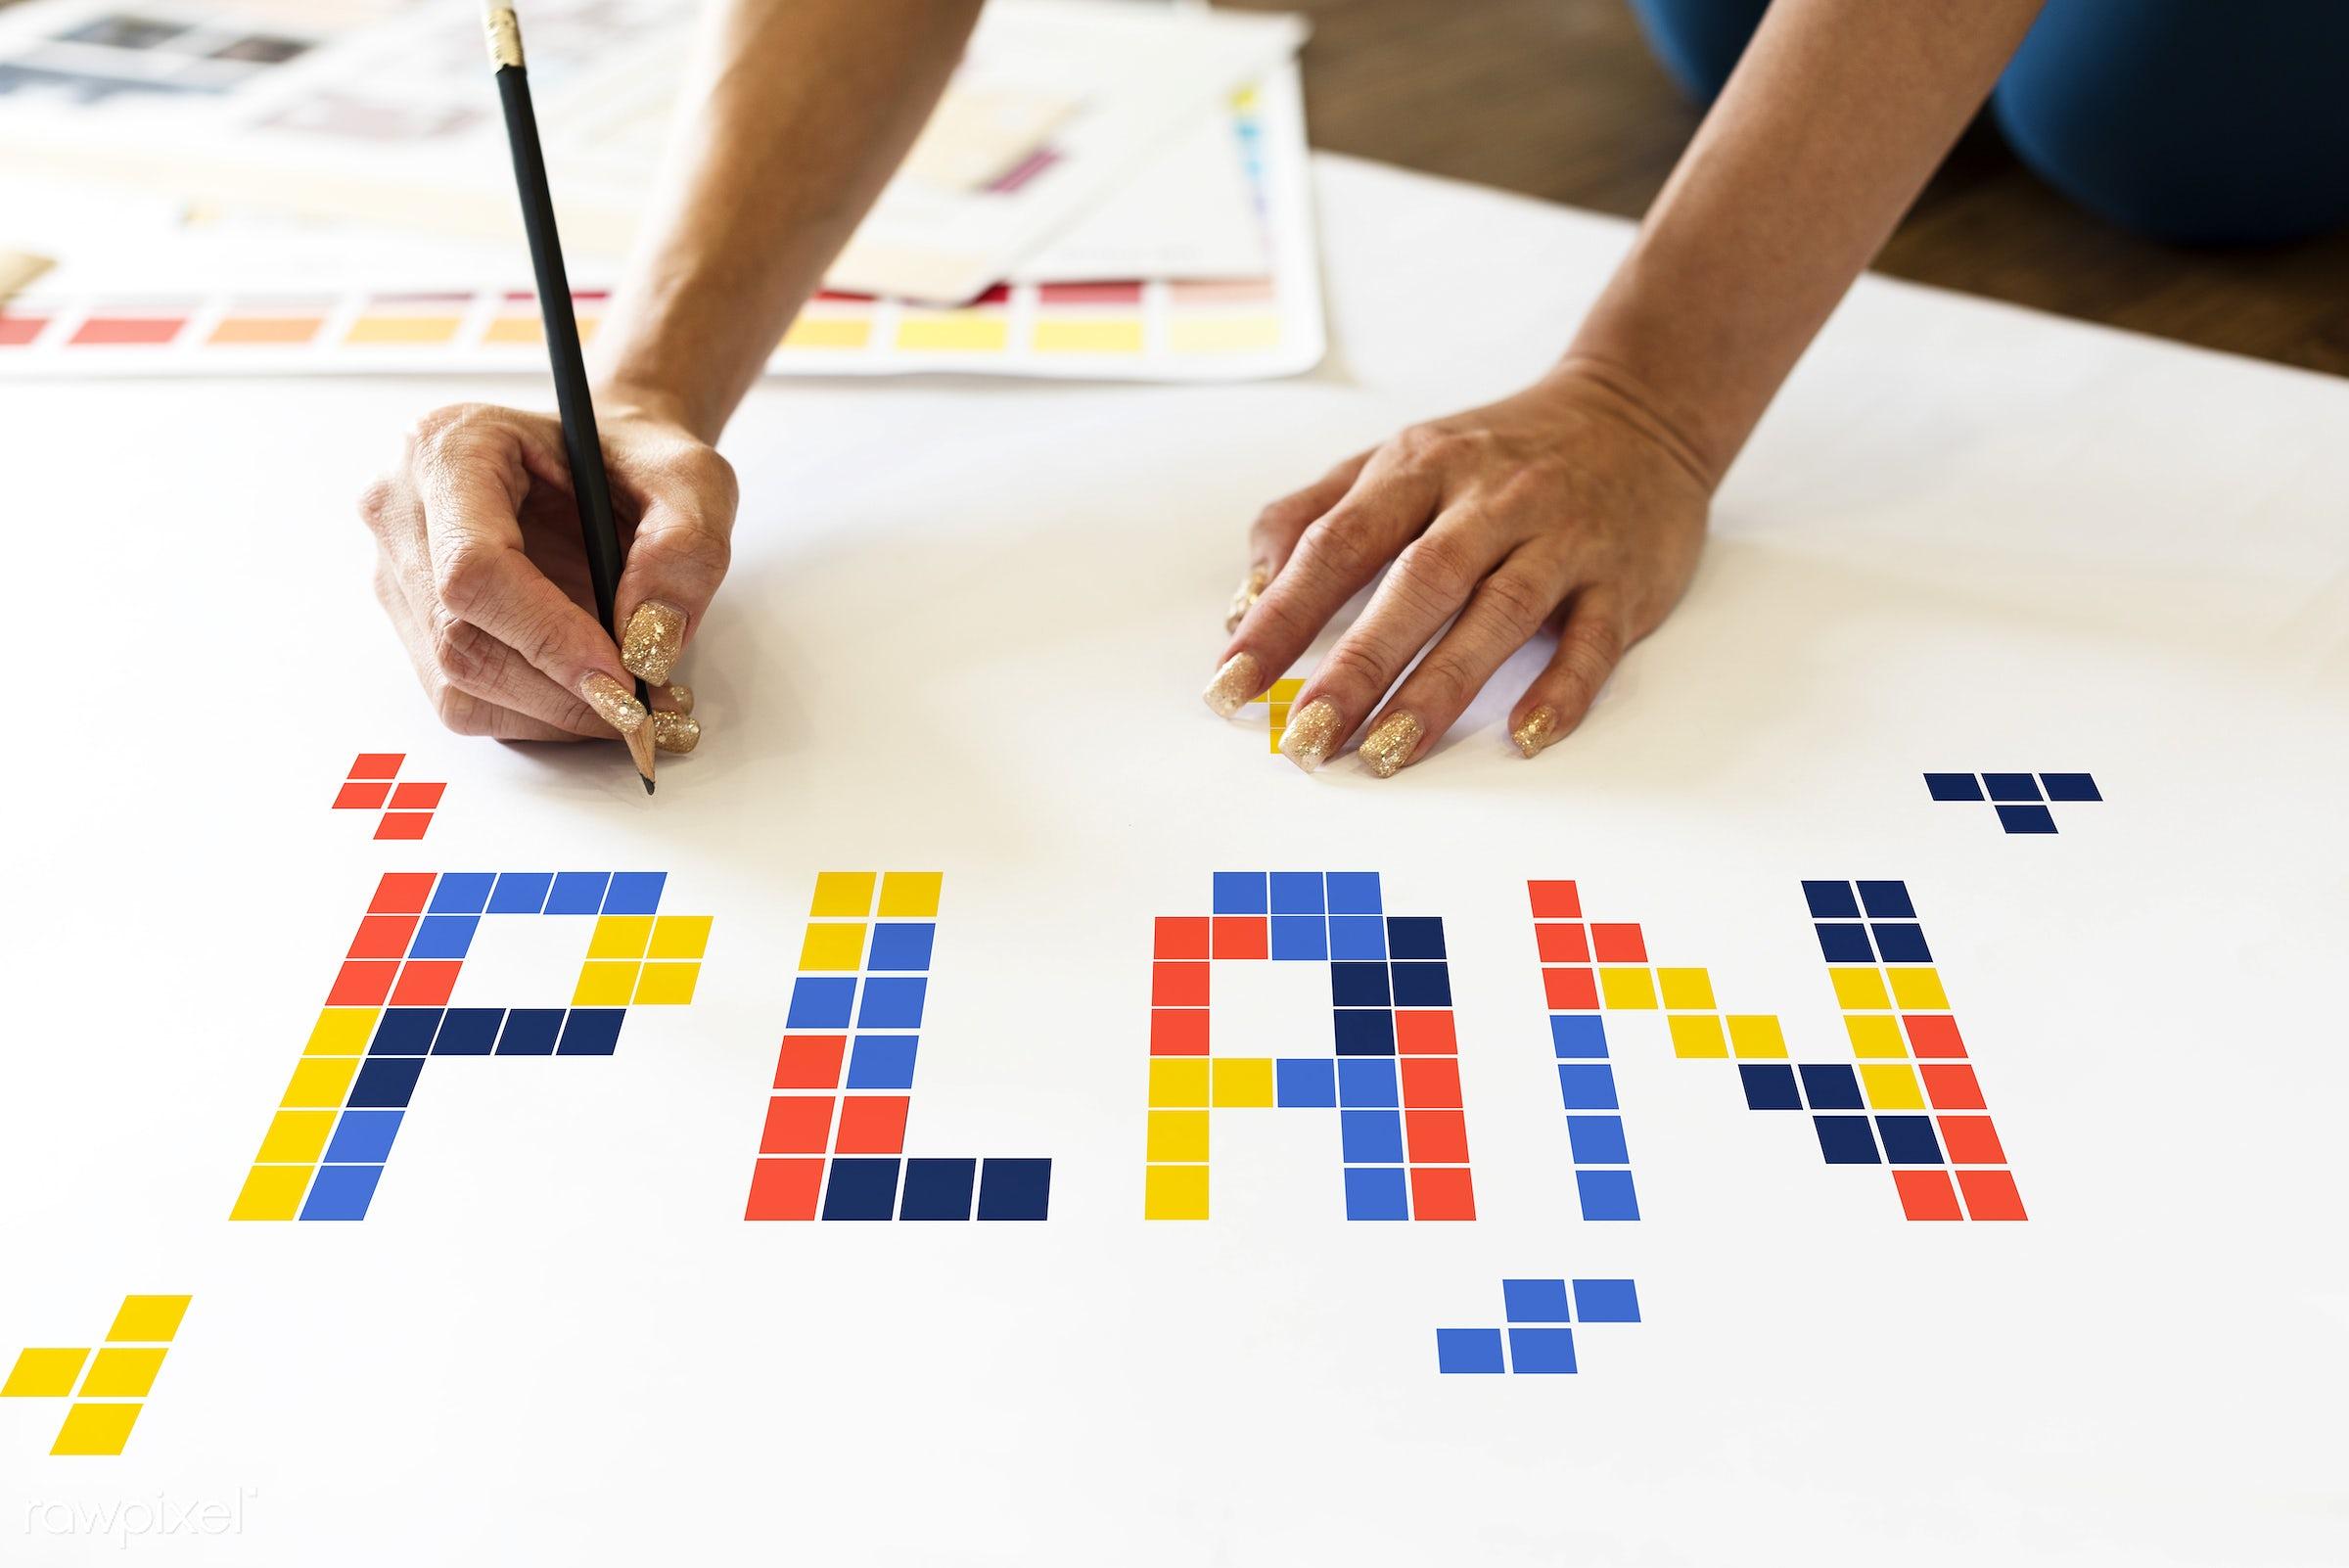 8 bit, art, block, brainstorm, creation, creative, creativity, design, drawing, game, graphic, hands, ideas, inspiration,...